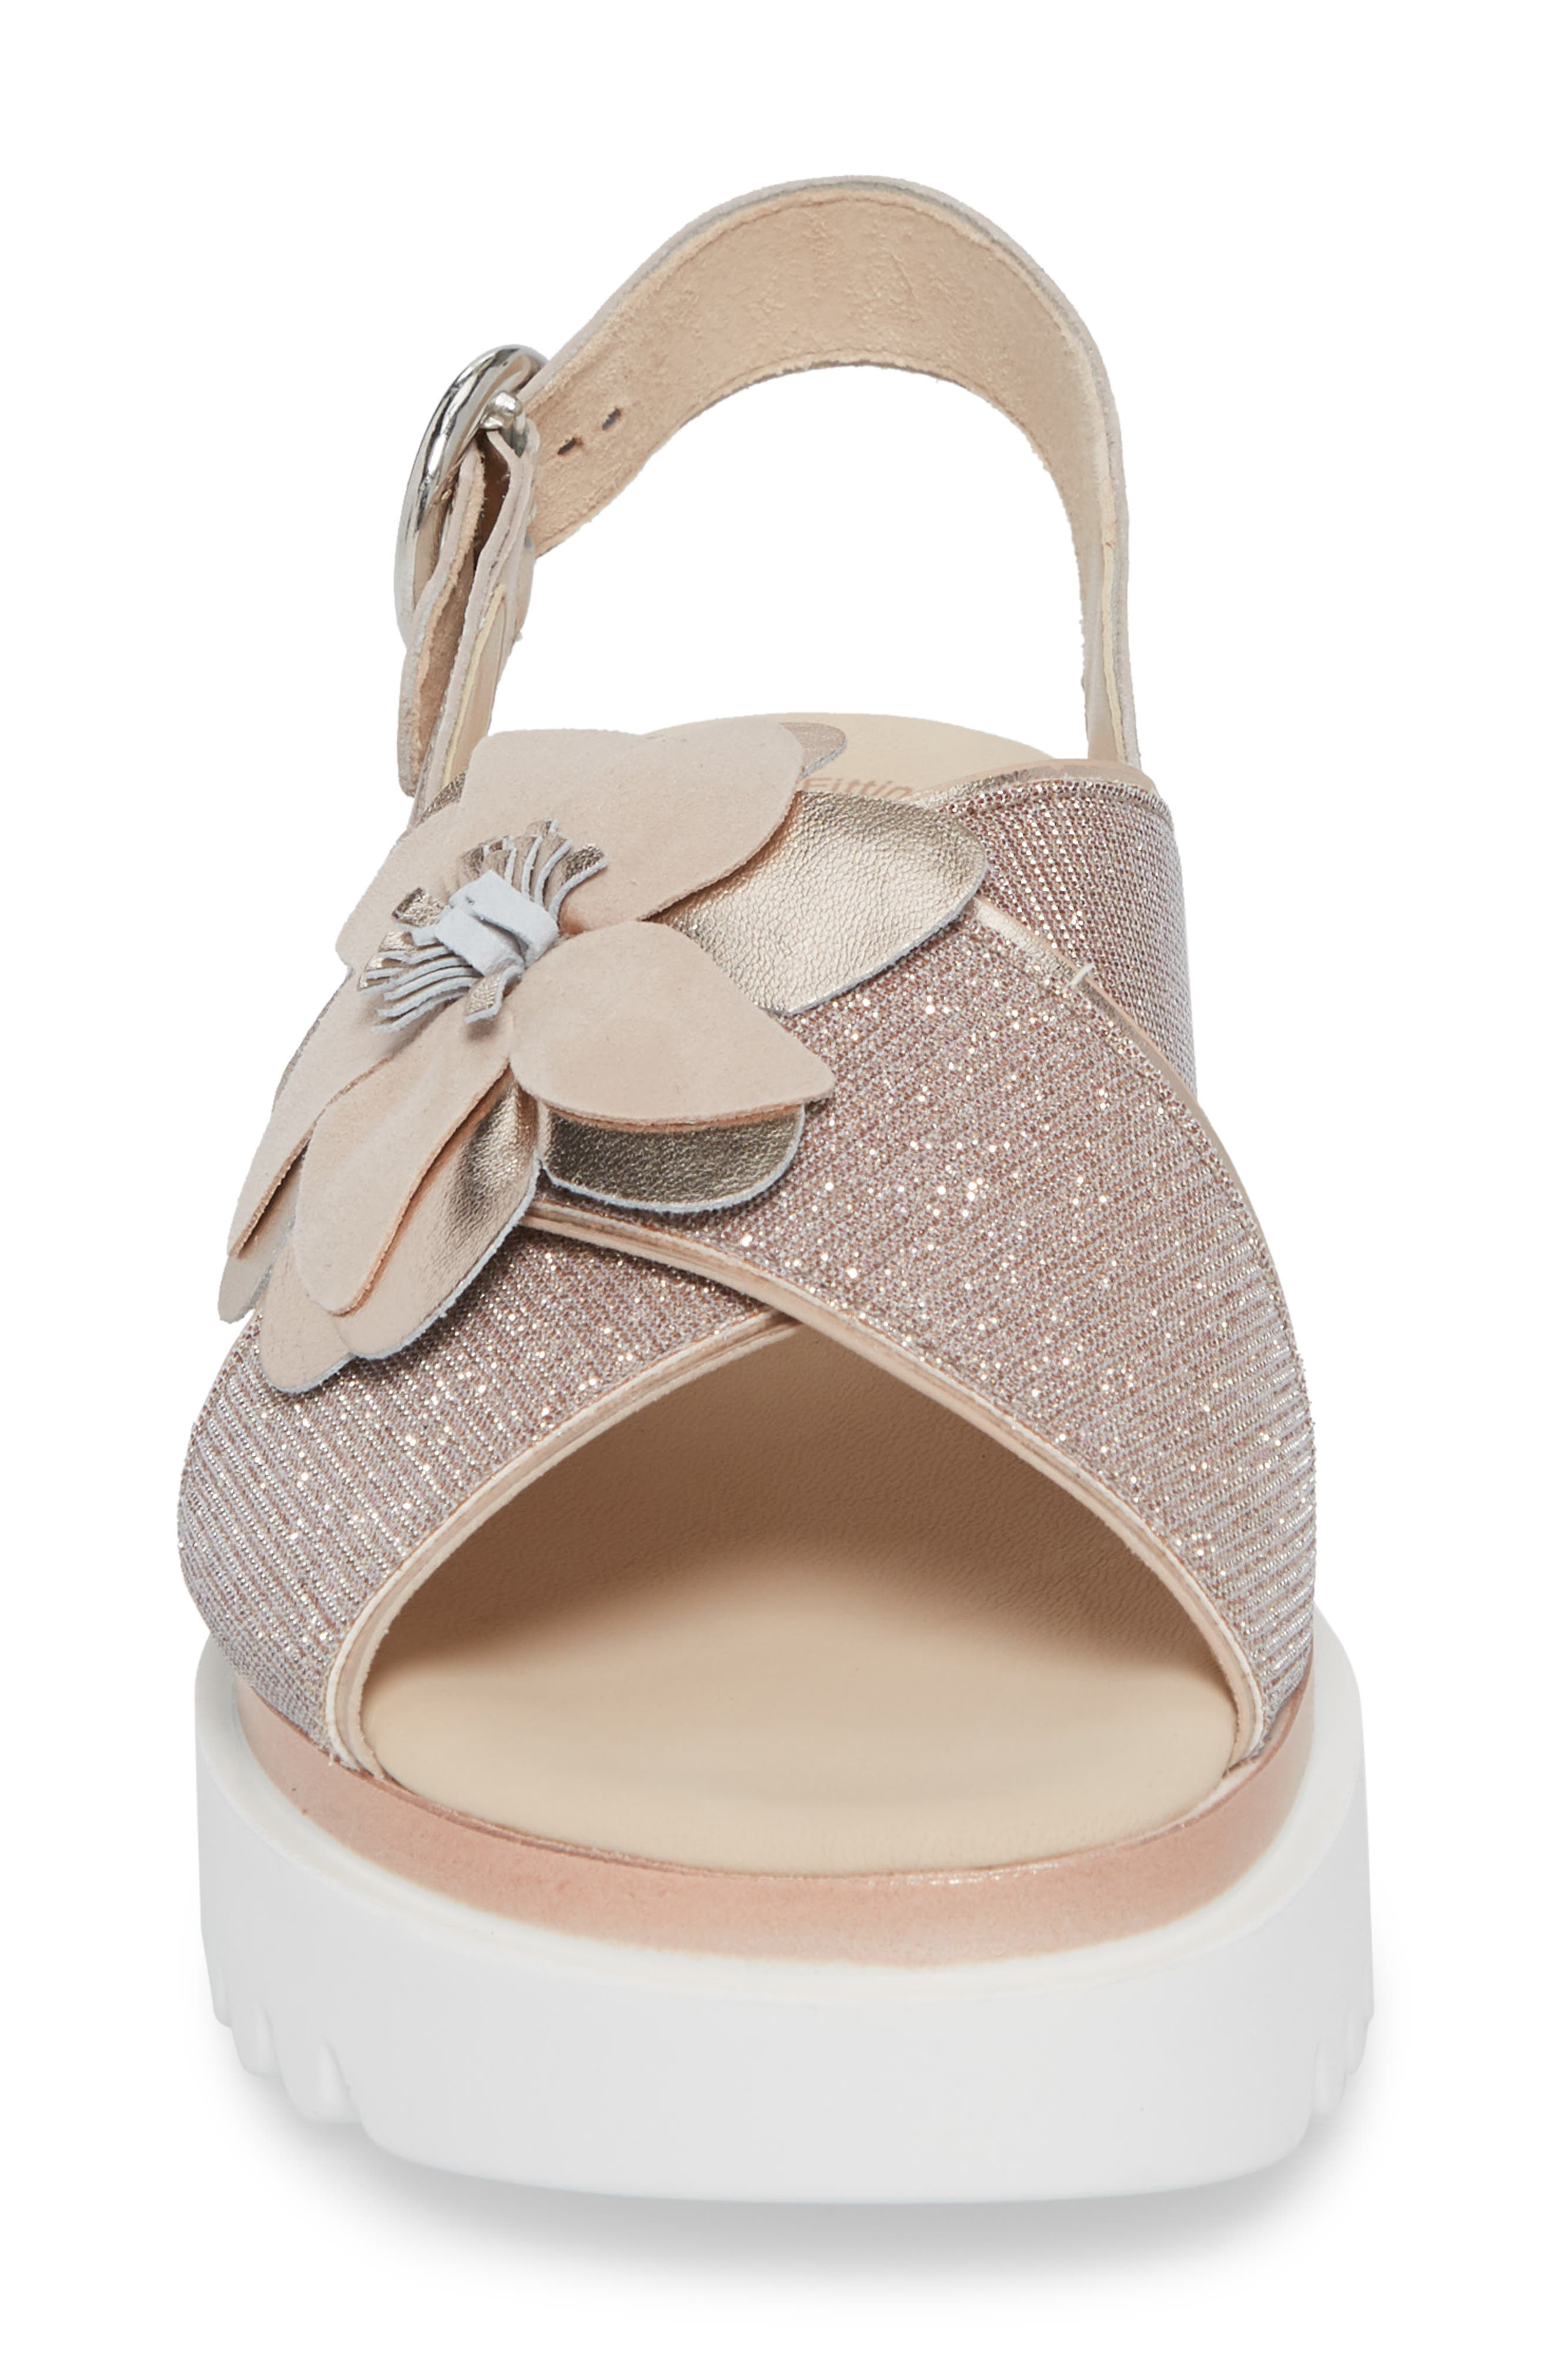 Flower Platform Sandal,                             Alternate thumbnail 4, color,                             Rose Metallic Fabric